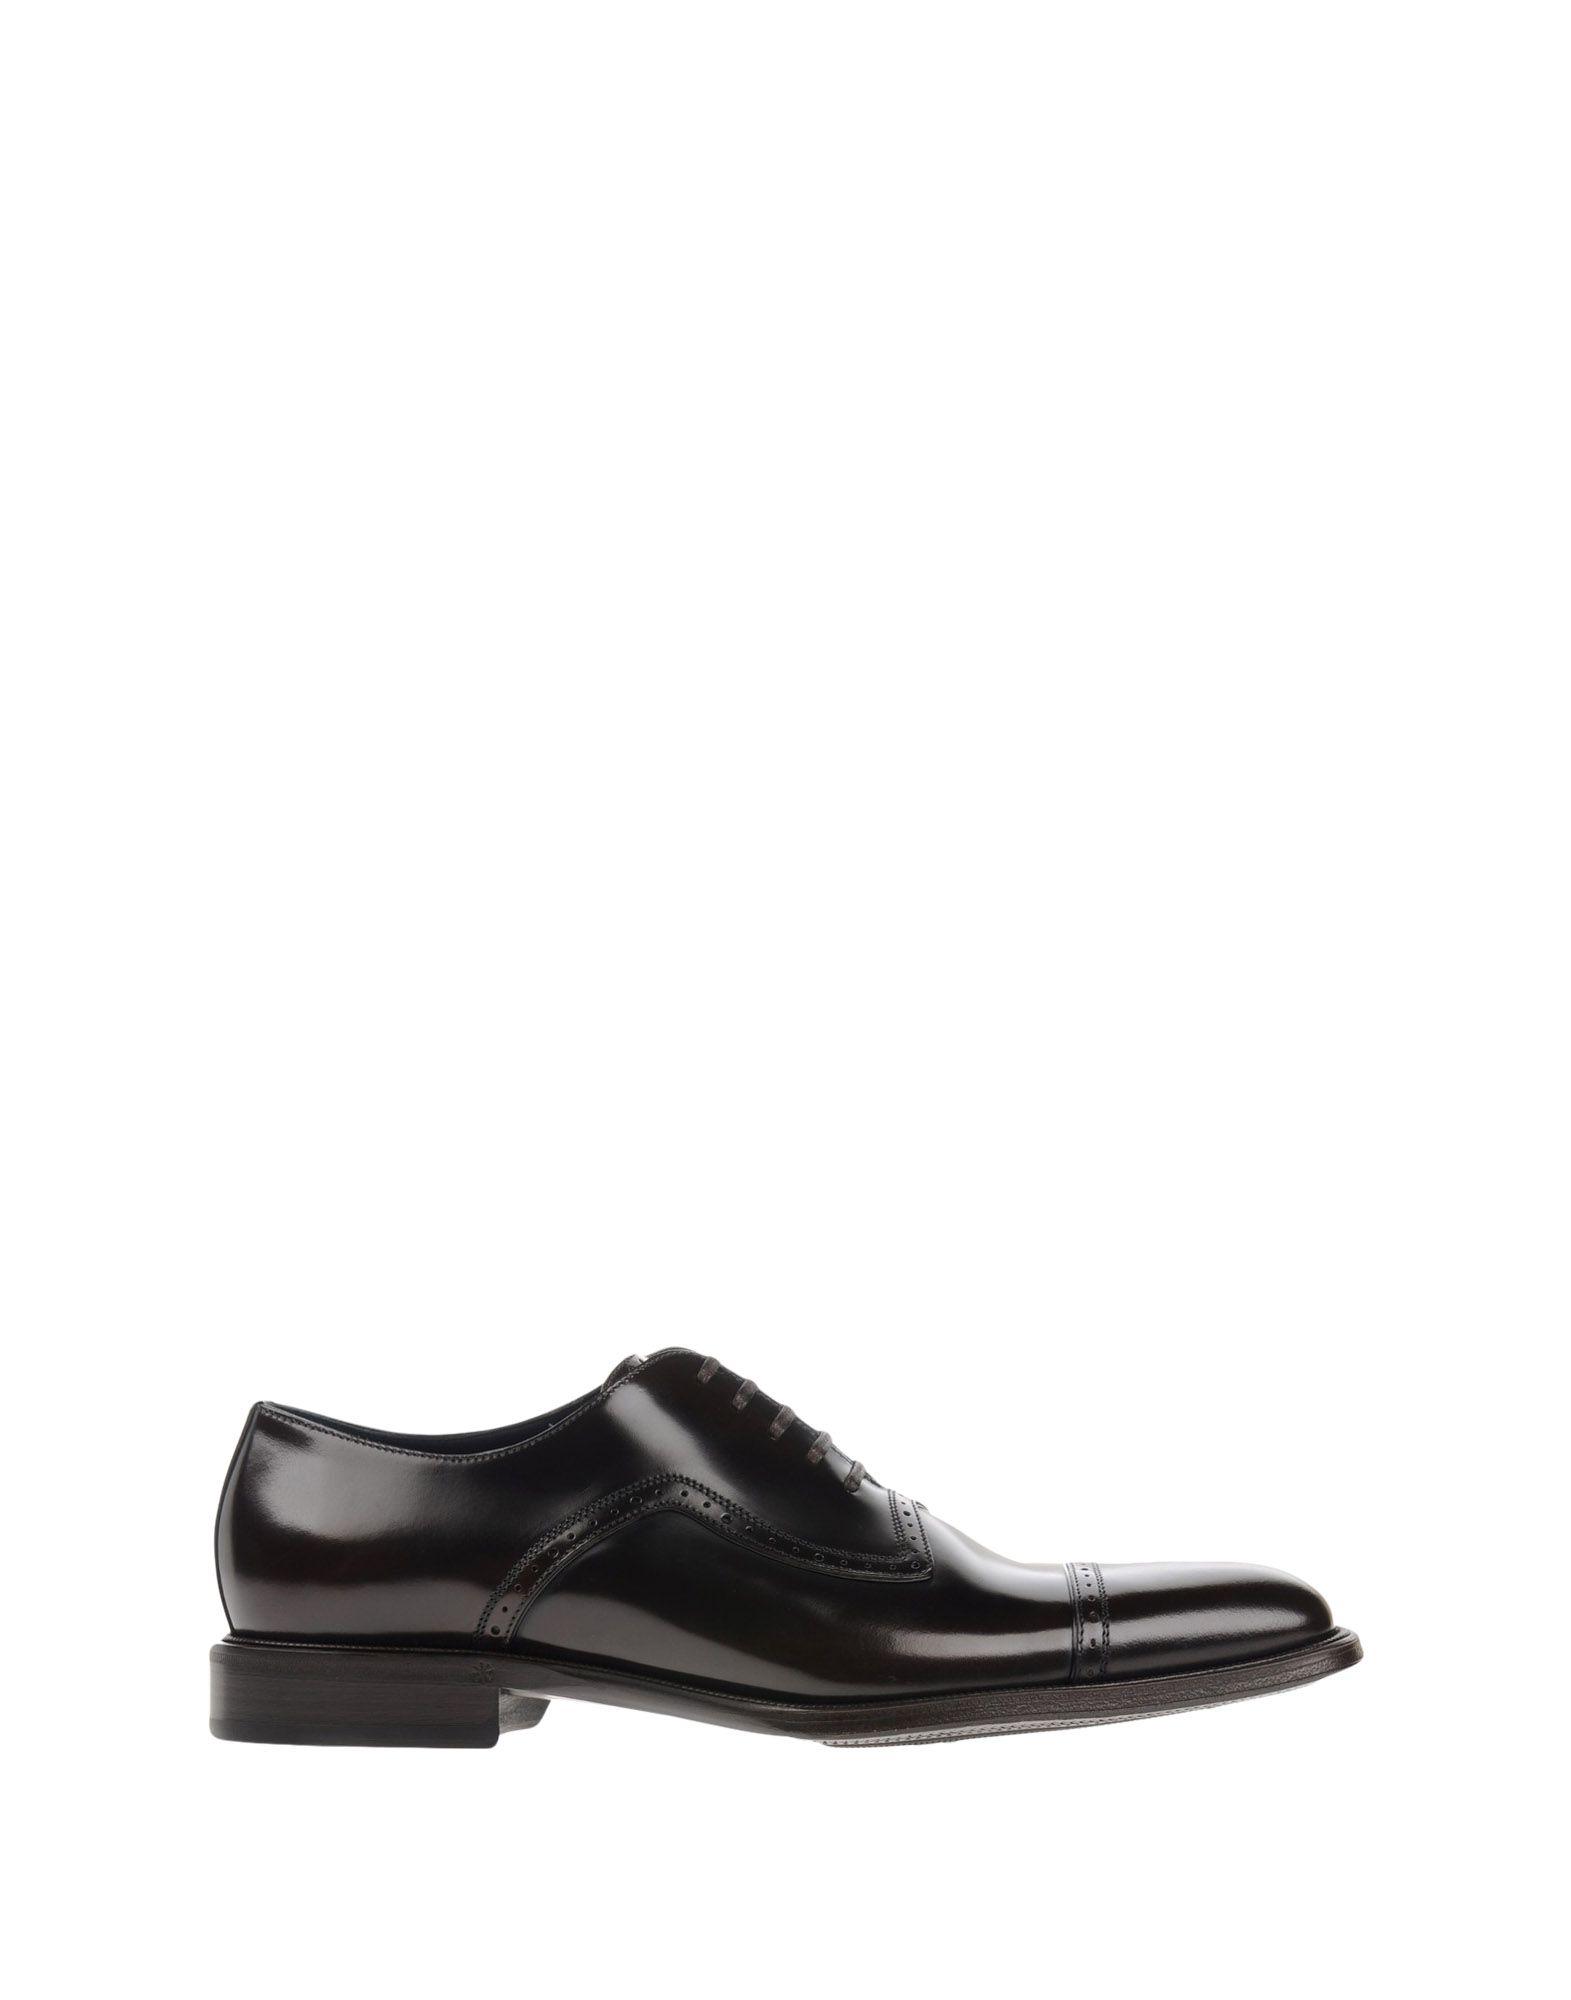 Chaussures À Lacets Dolce & Gabbana Homme - Chaussures À Lacets Dolce & Gabbana sur